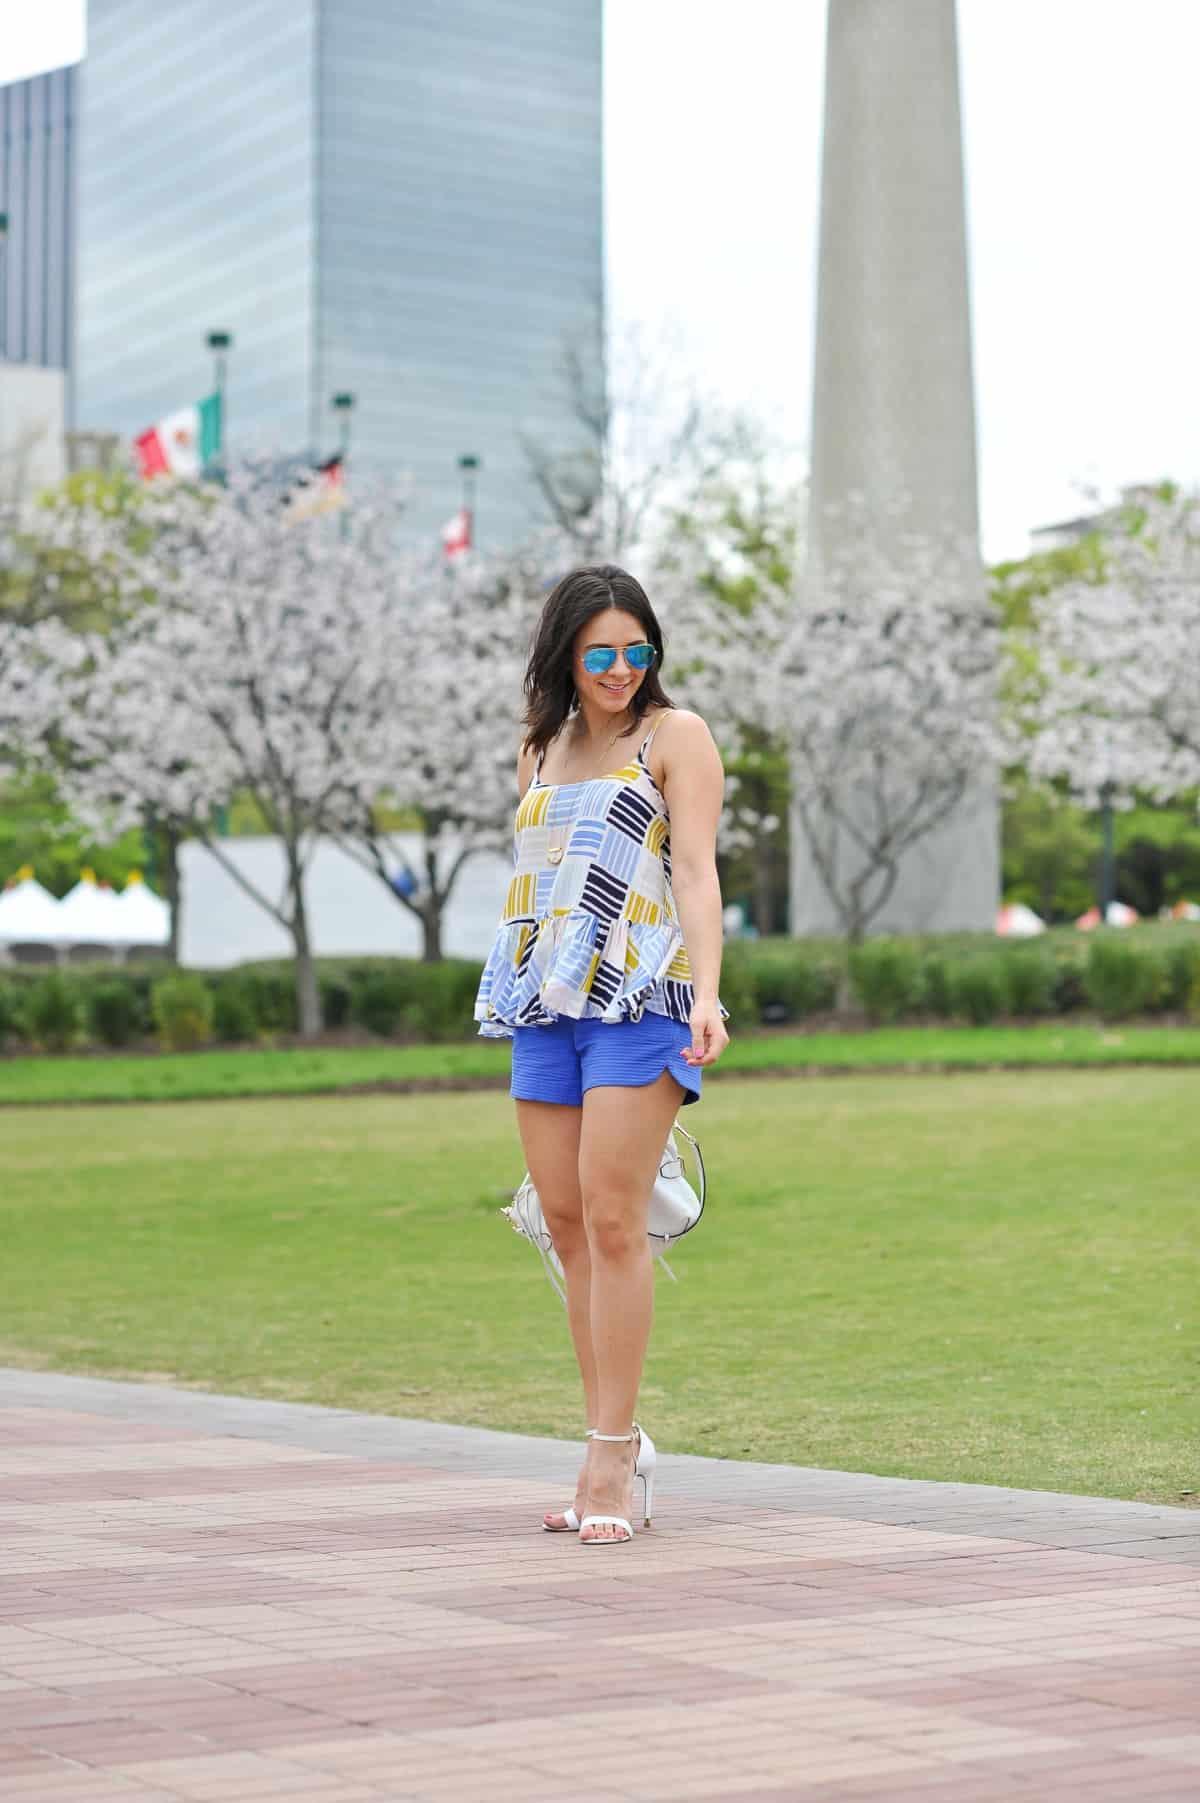 Old Navy printed peplum tank - summer outfit ideas - My Style Vita - @mystylevita - 8